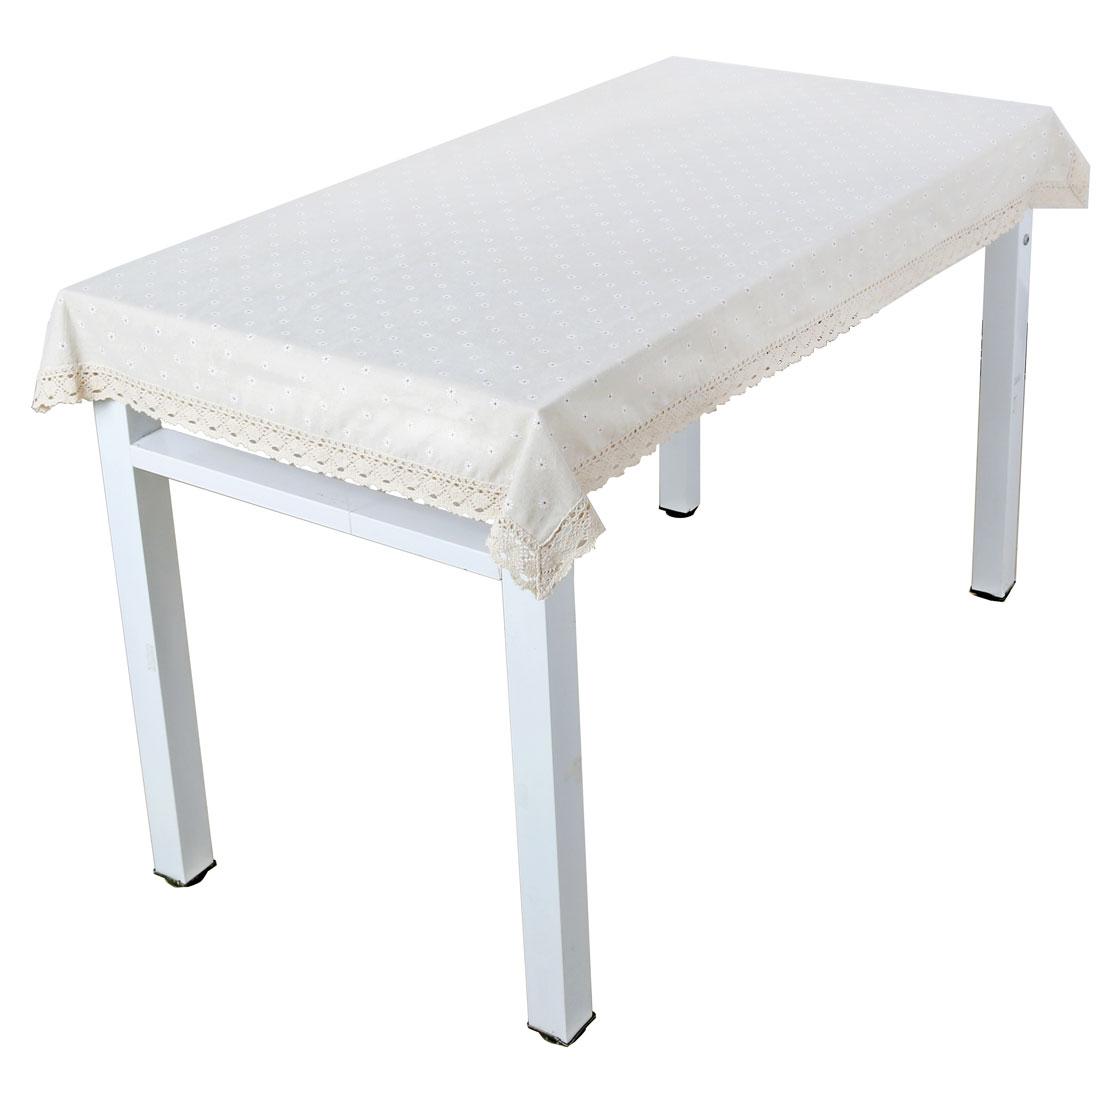 Vintage White Chrysanthemum Tablecloth Cotton Linen Washable Table Cover 140 x 180cm